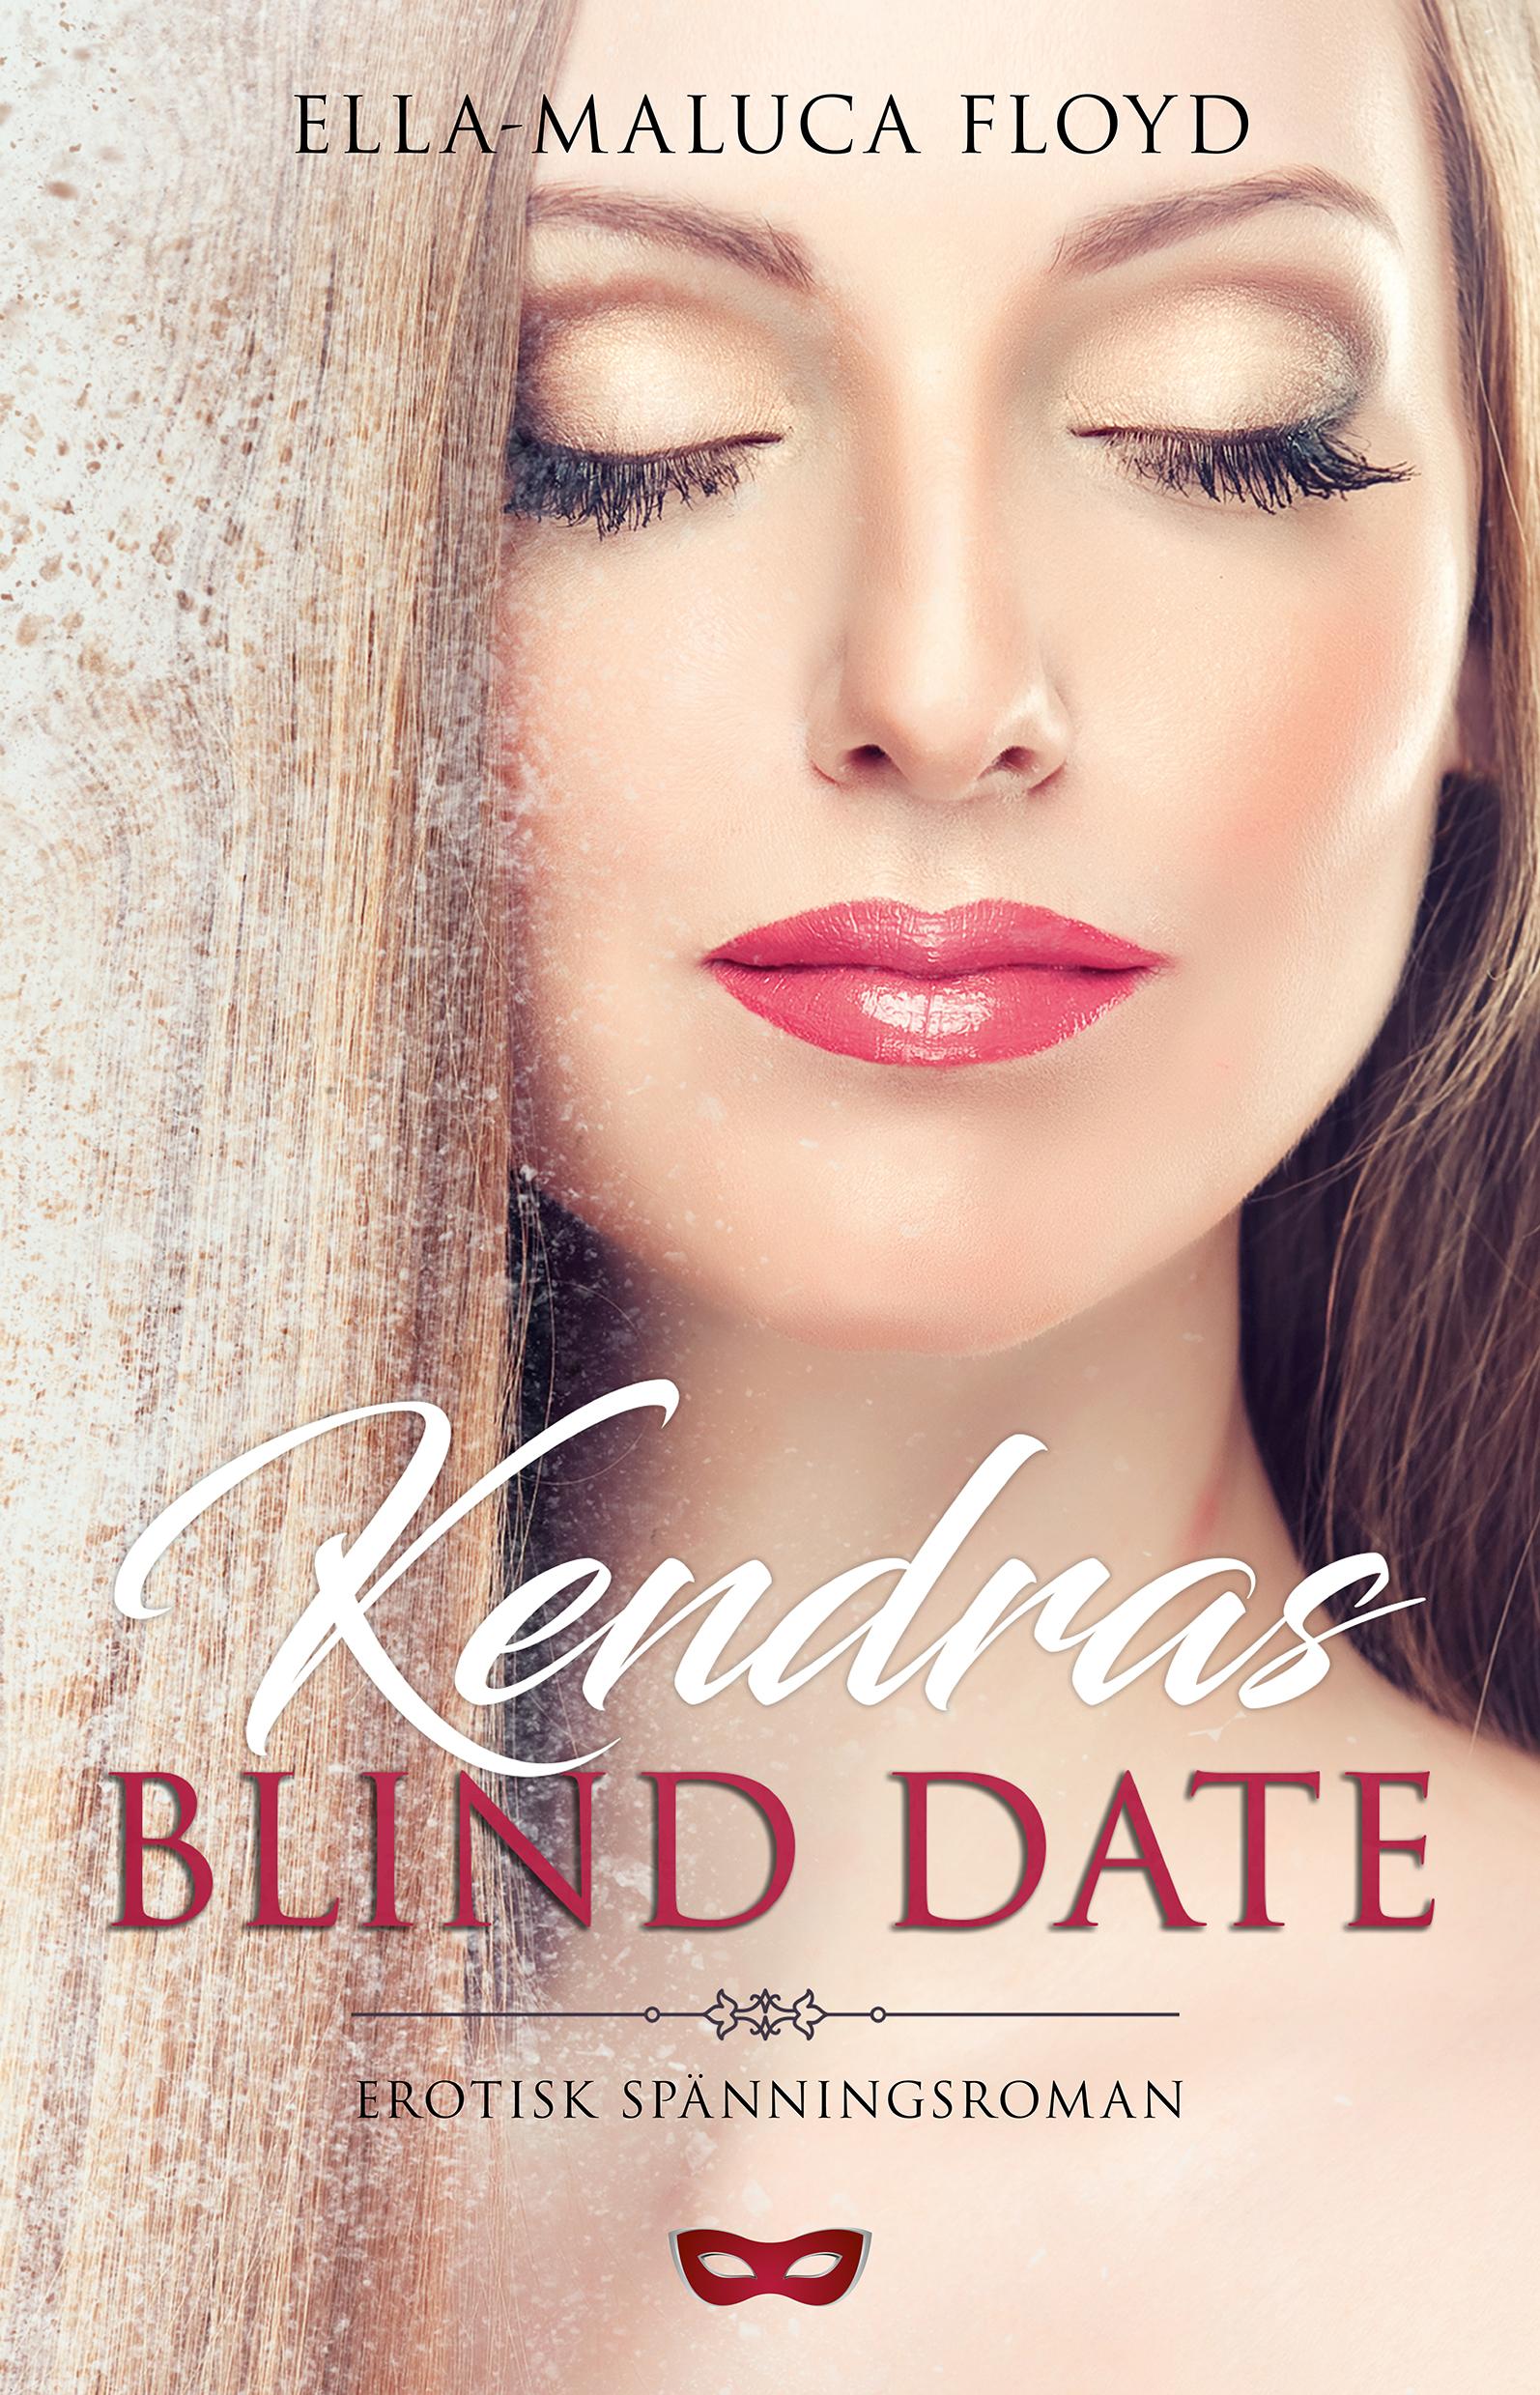 KENDRA_Kendras blind date_omslag_WEBB.jpg